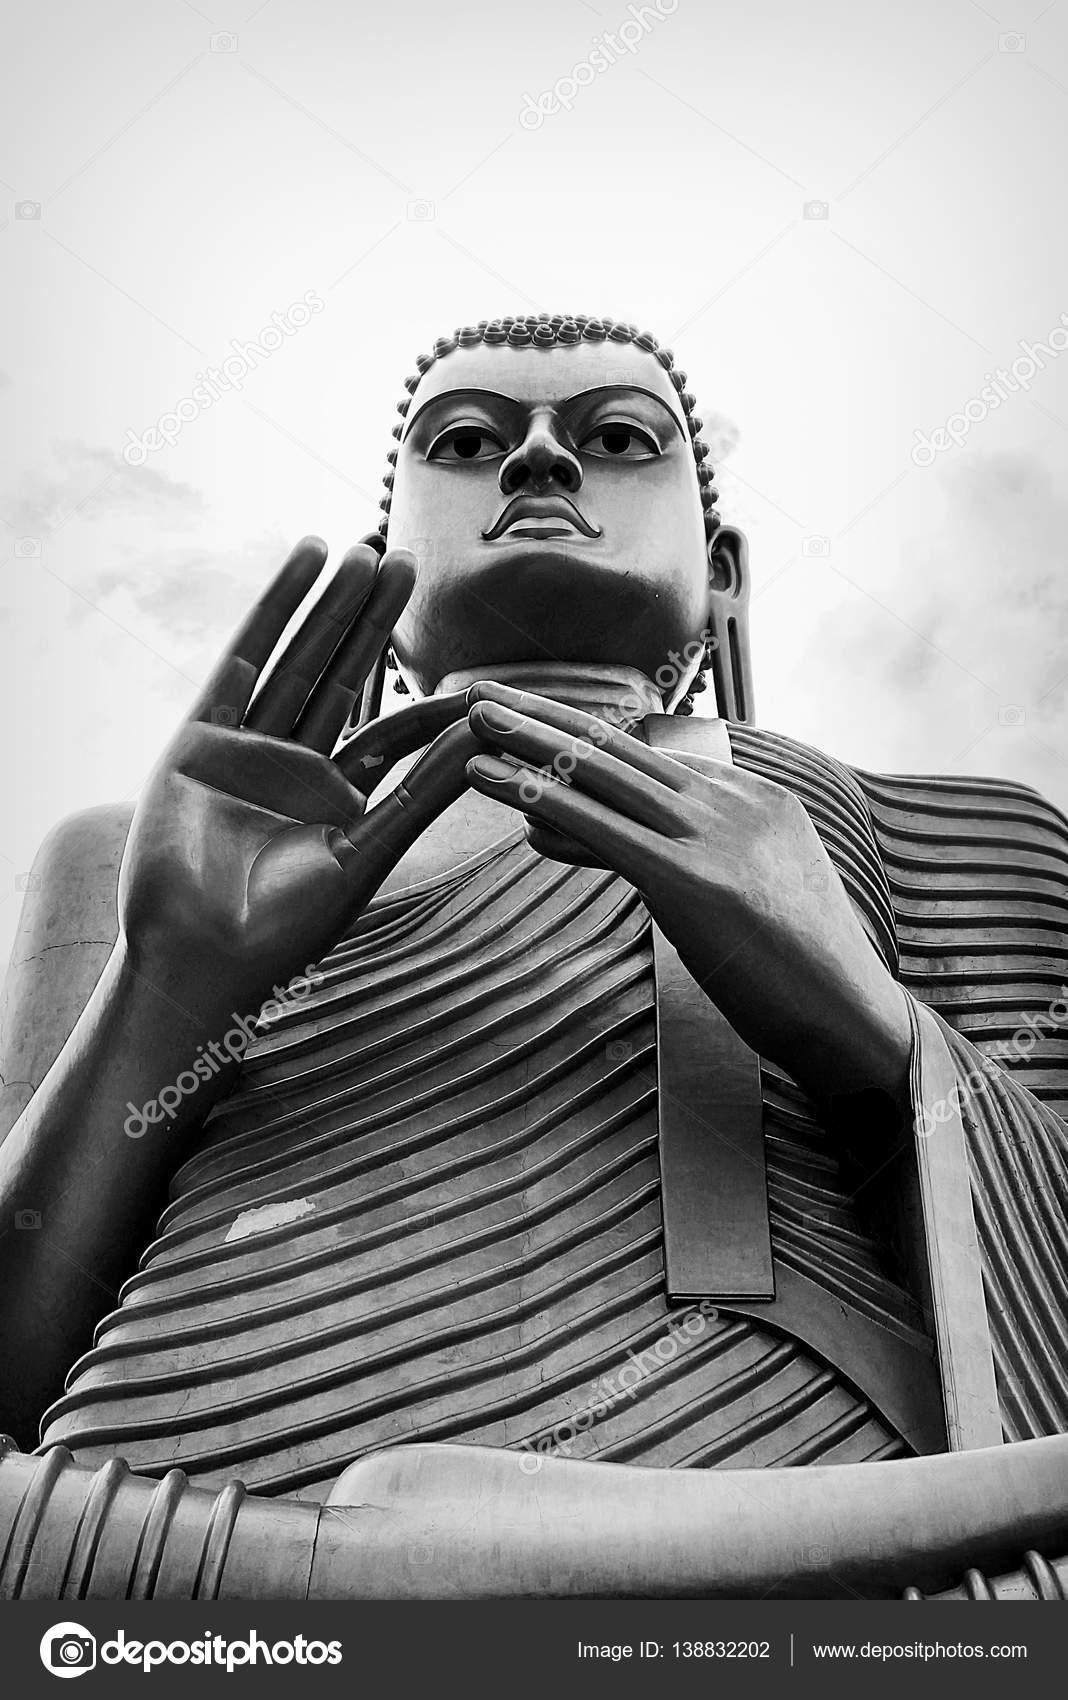 Buddha statue at dambulla cave golden temple sri lanka black and white photo